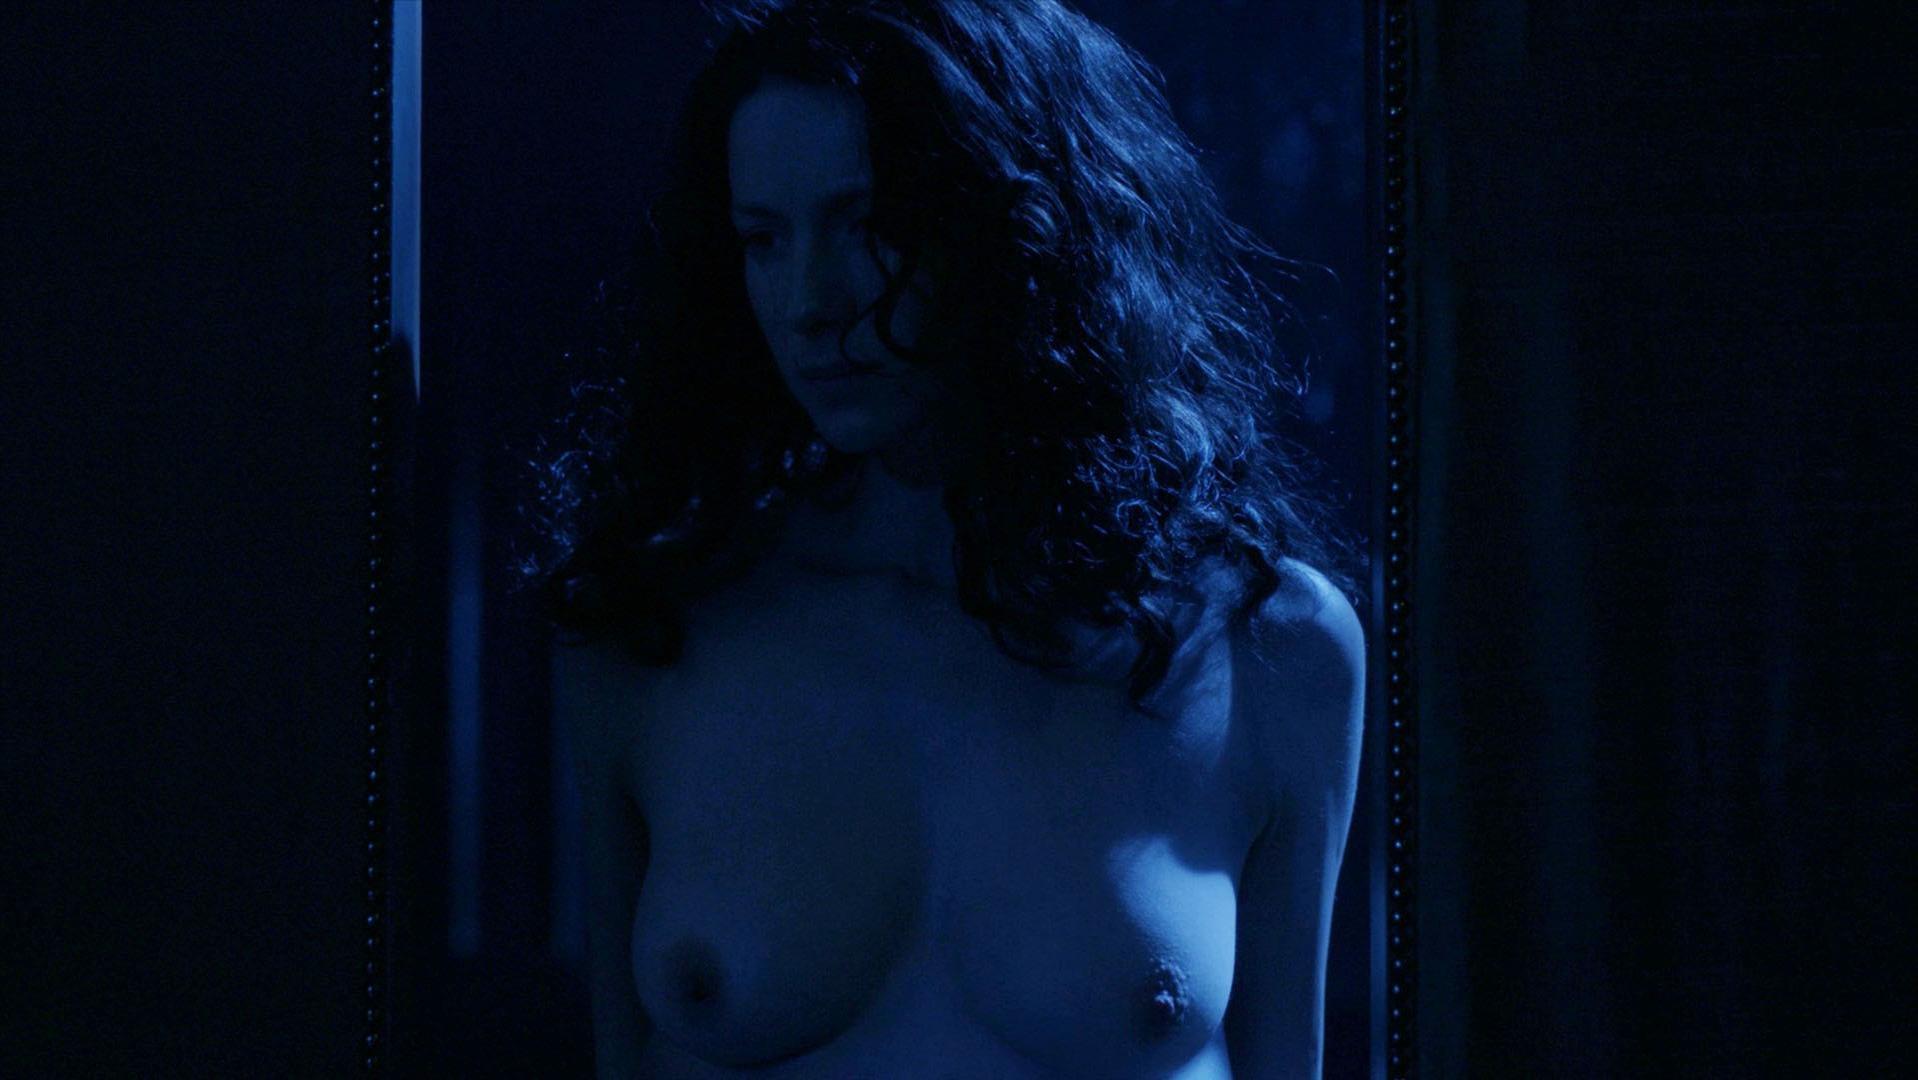 Caitriona Balfe nude - Outlander s02e04 (2016)